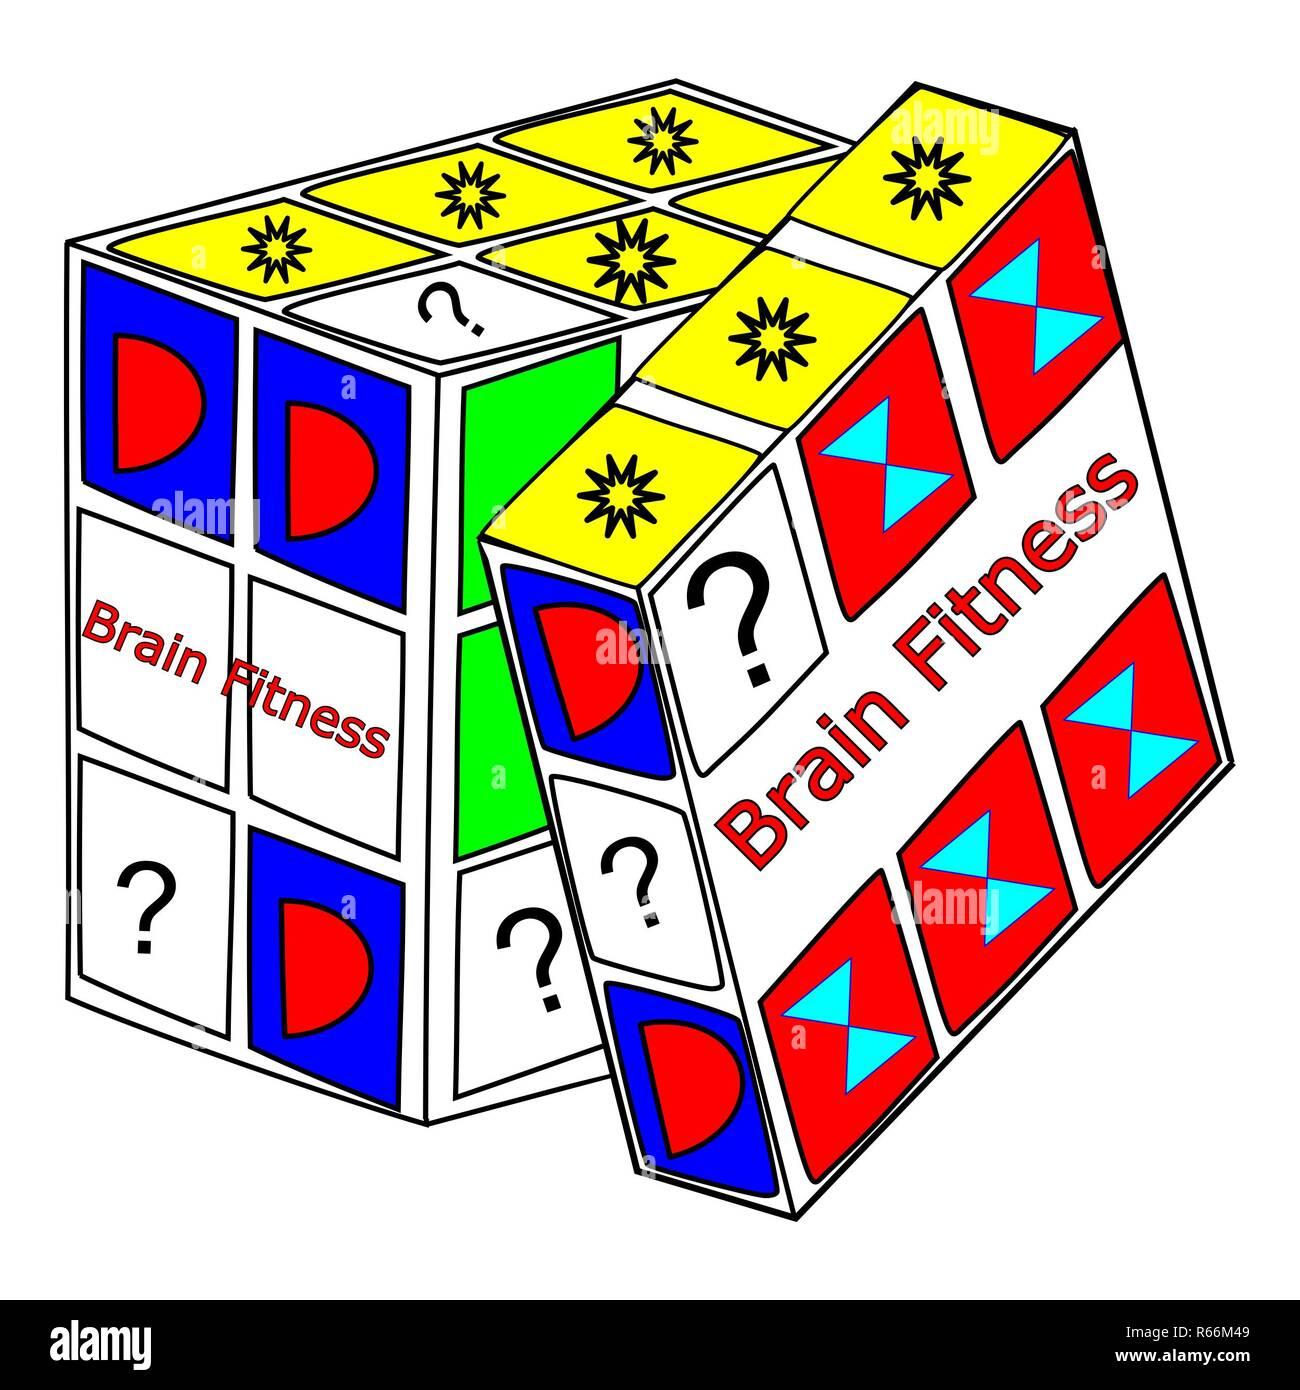 decorative Brain Fitness cube – illustration - Stock Image